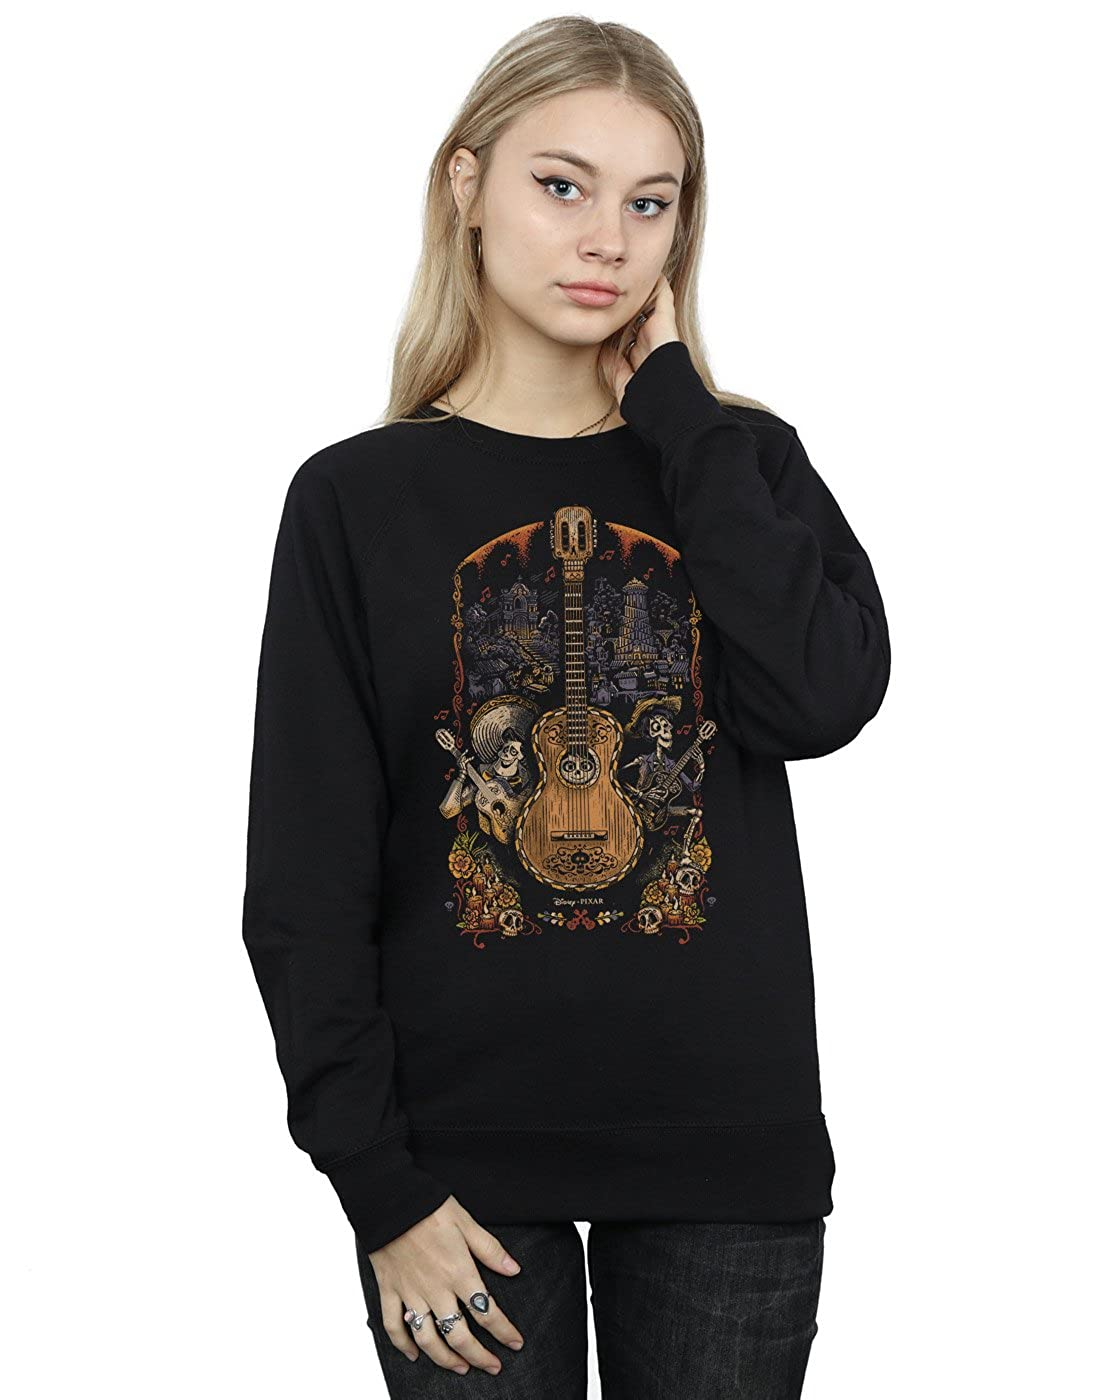 Disney Women's Coco Guitar Poster Sweatshirt Absolute Cult